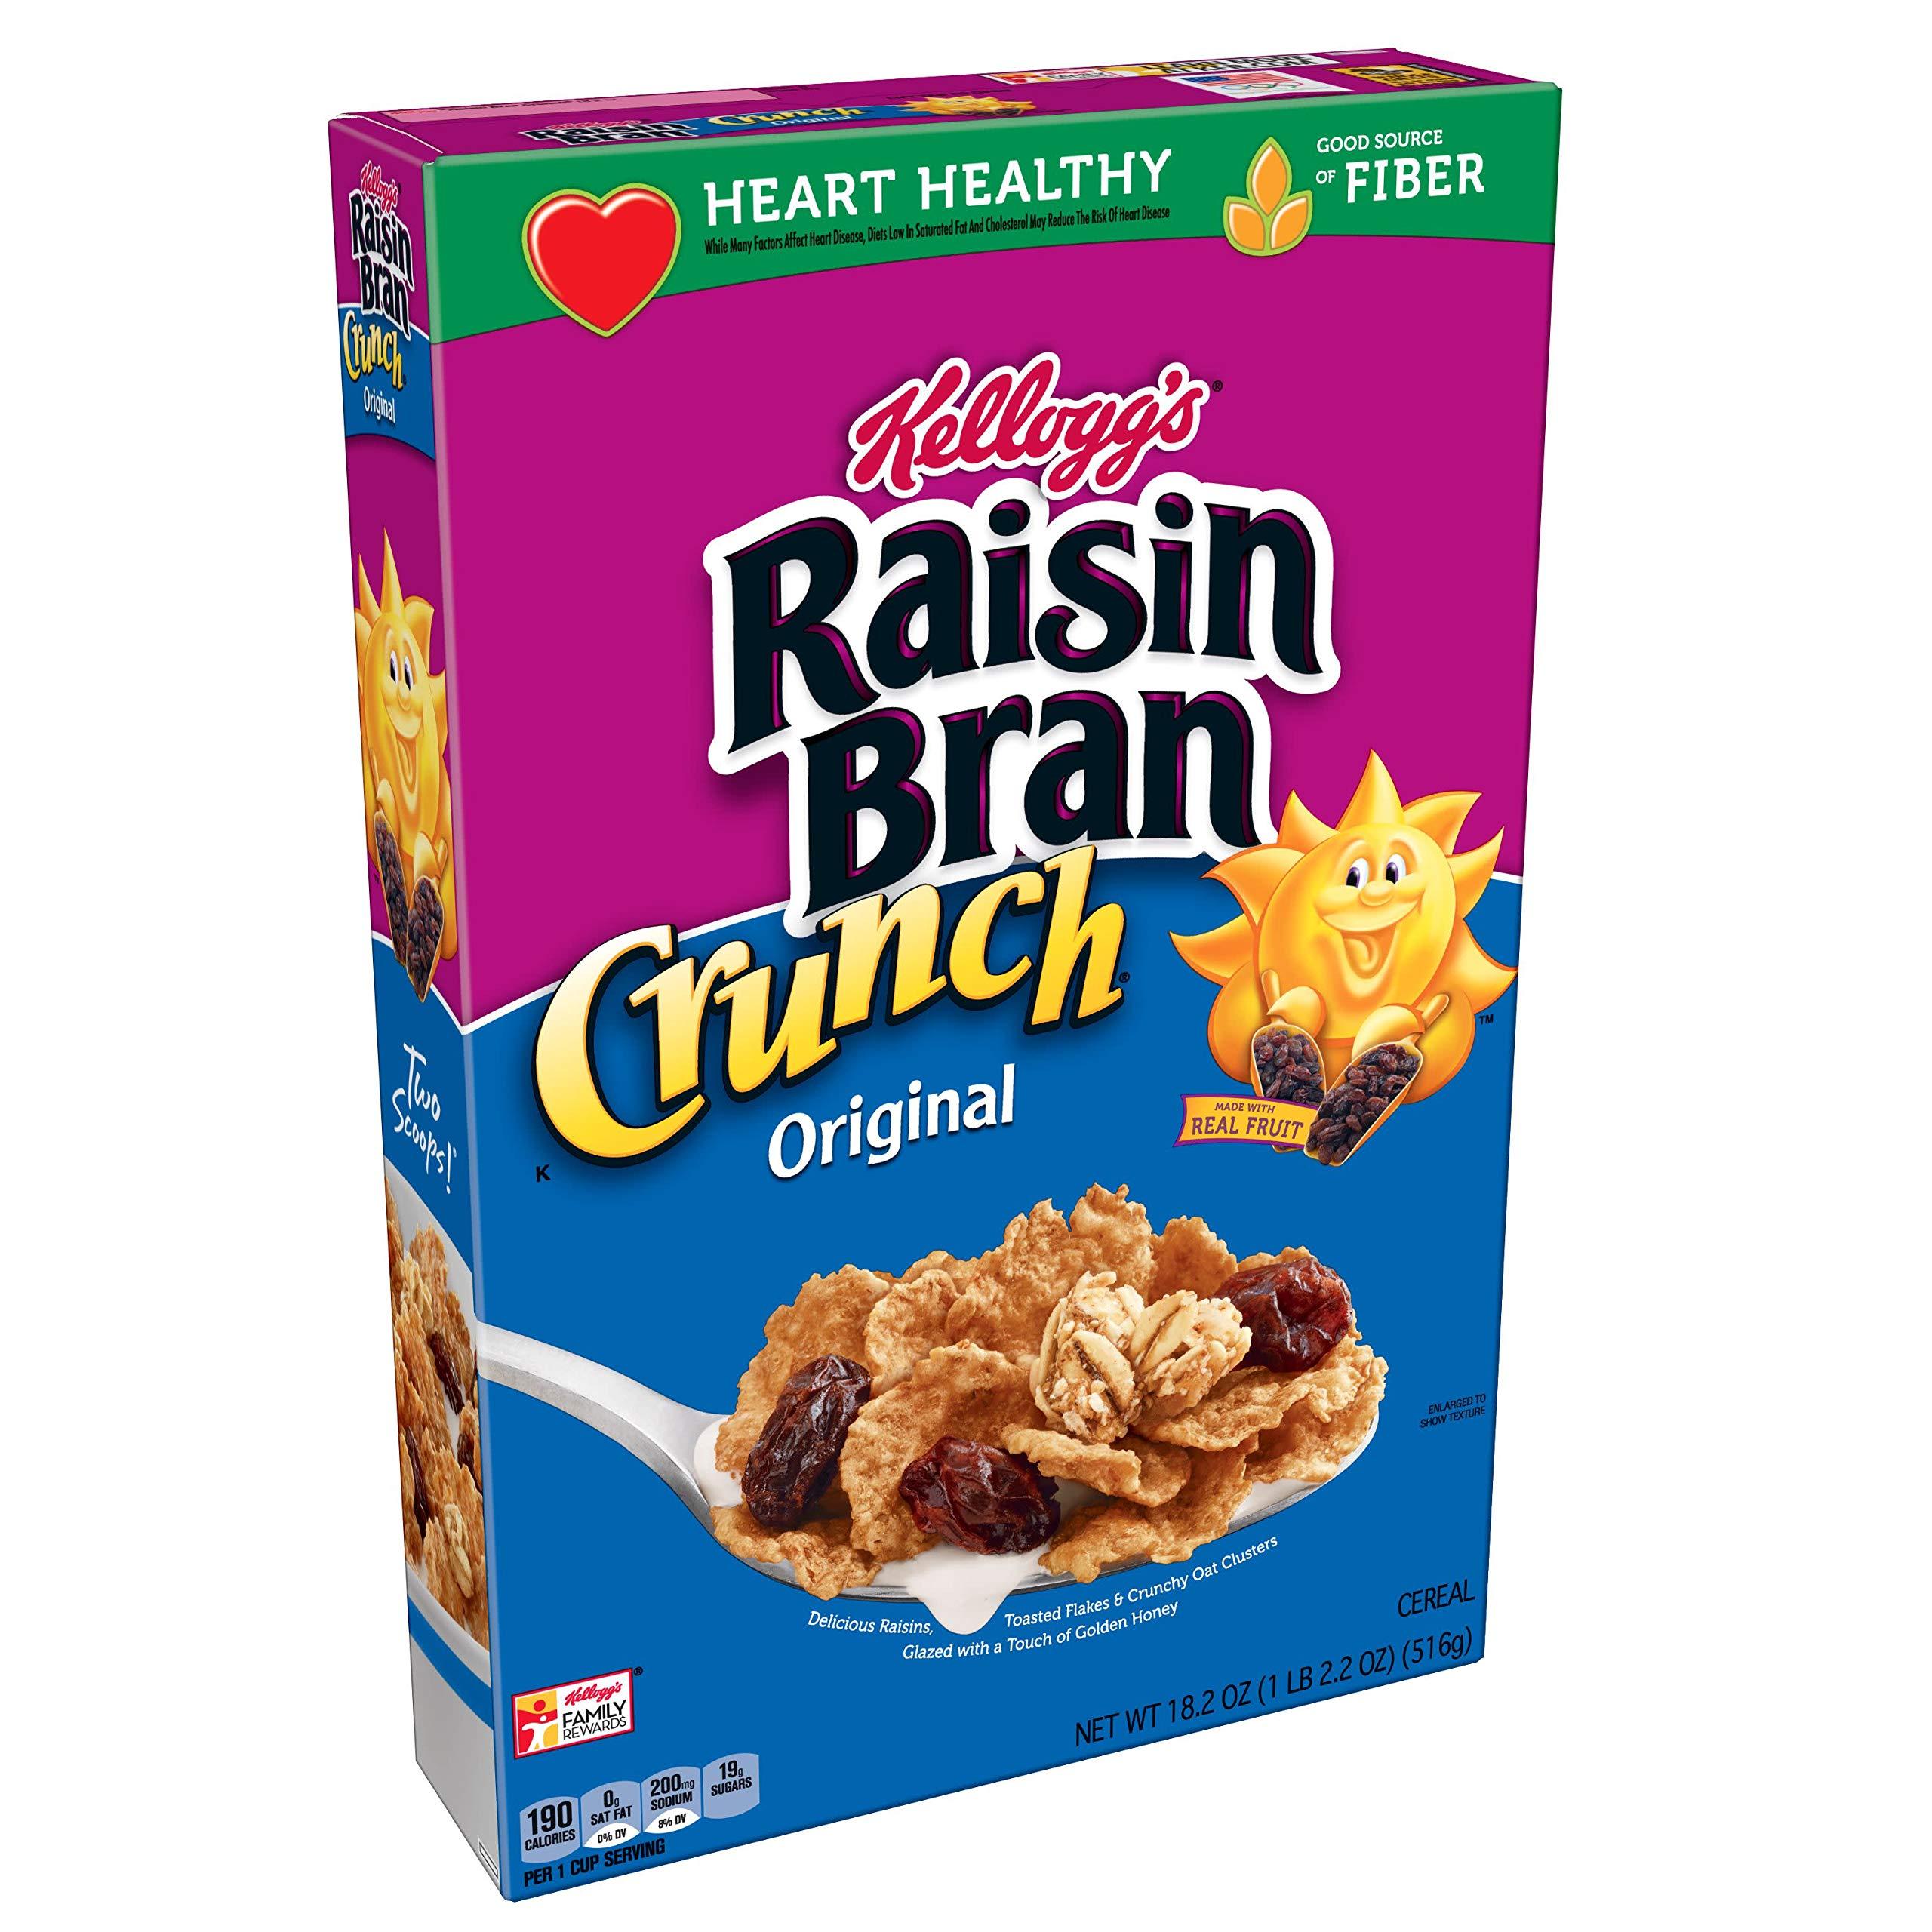 Amazon.com: NEW! Kellogg's Raisin Bran Crunch Apple